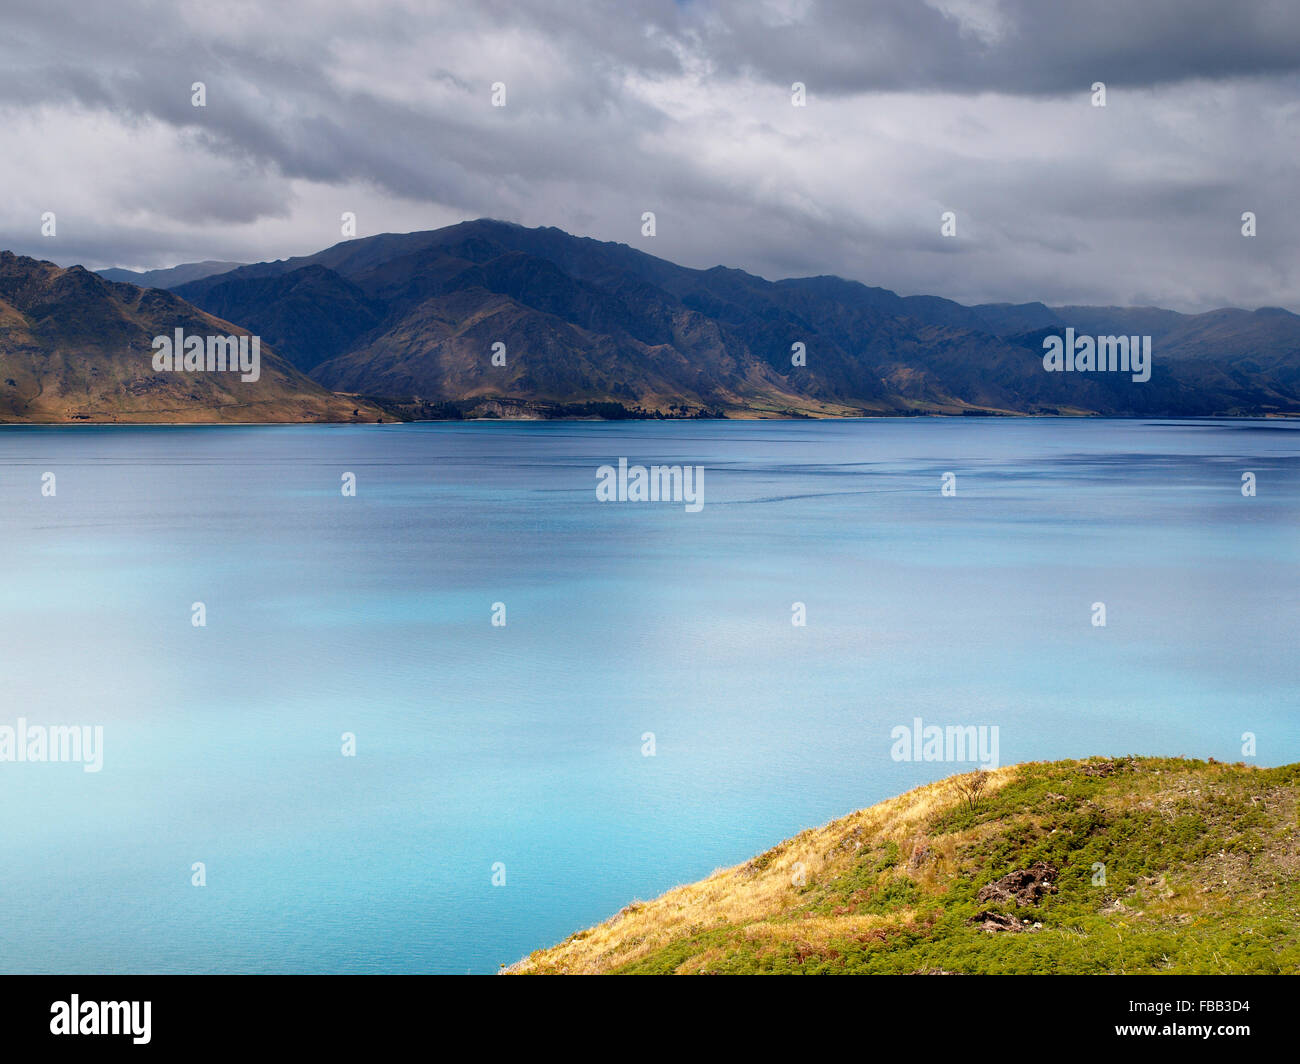 Lake Hawea, South Island, New Zealand - Stock Image